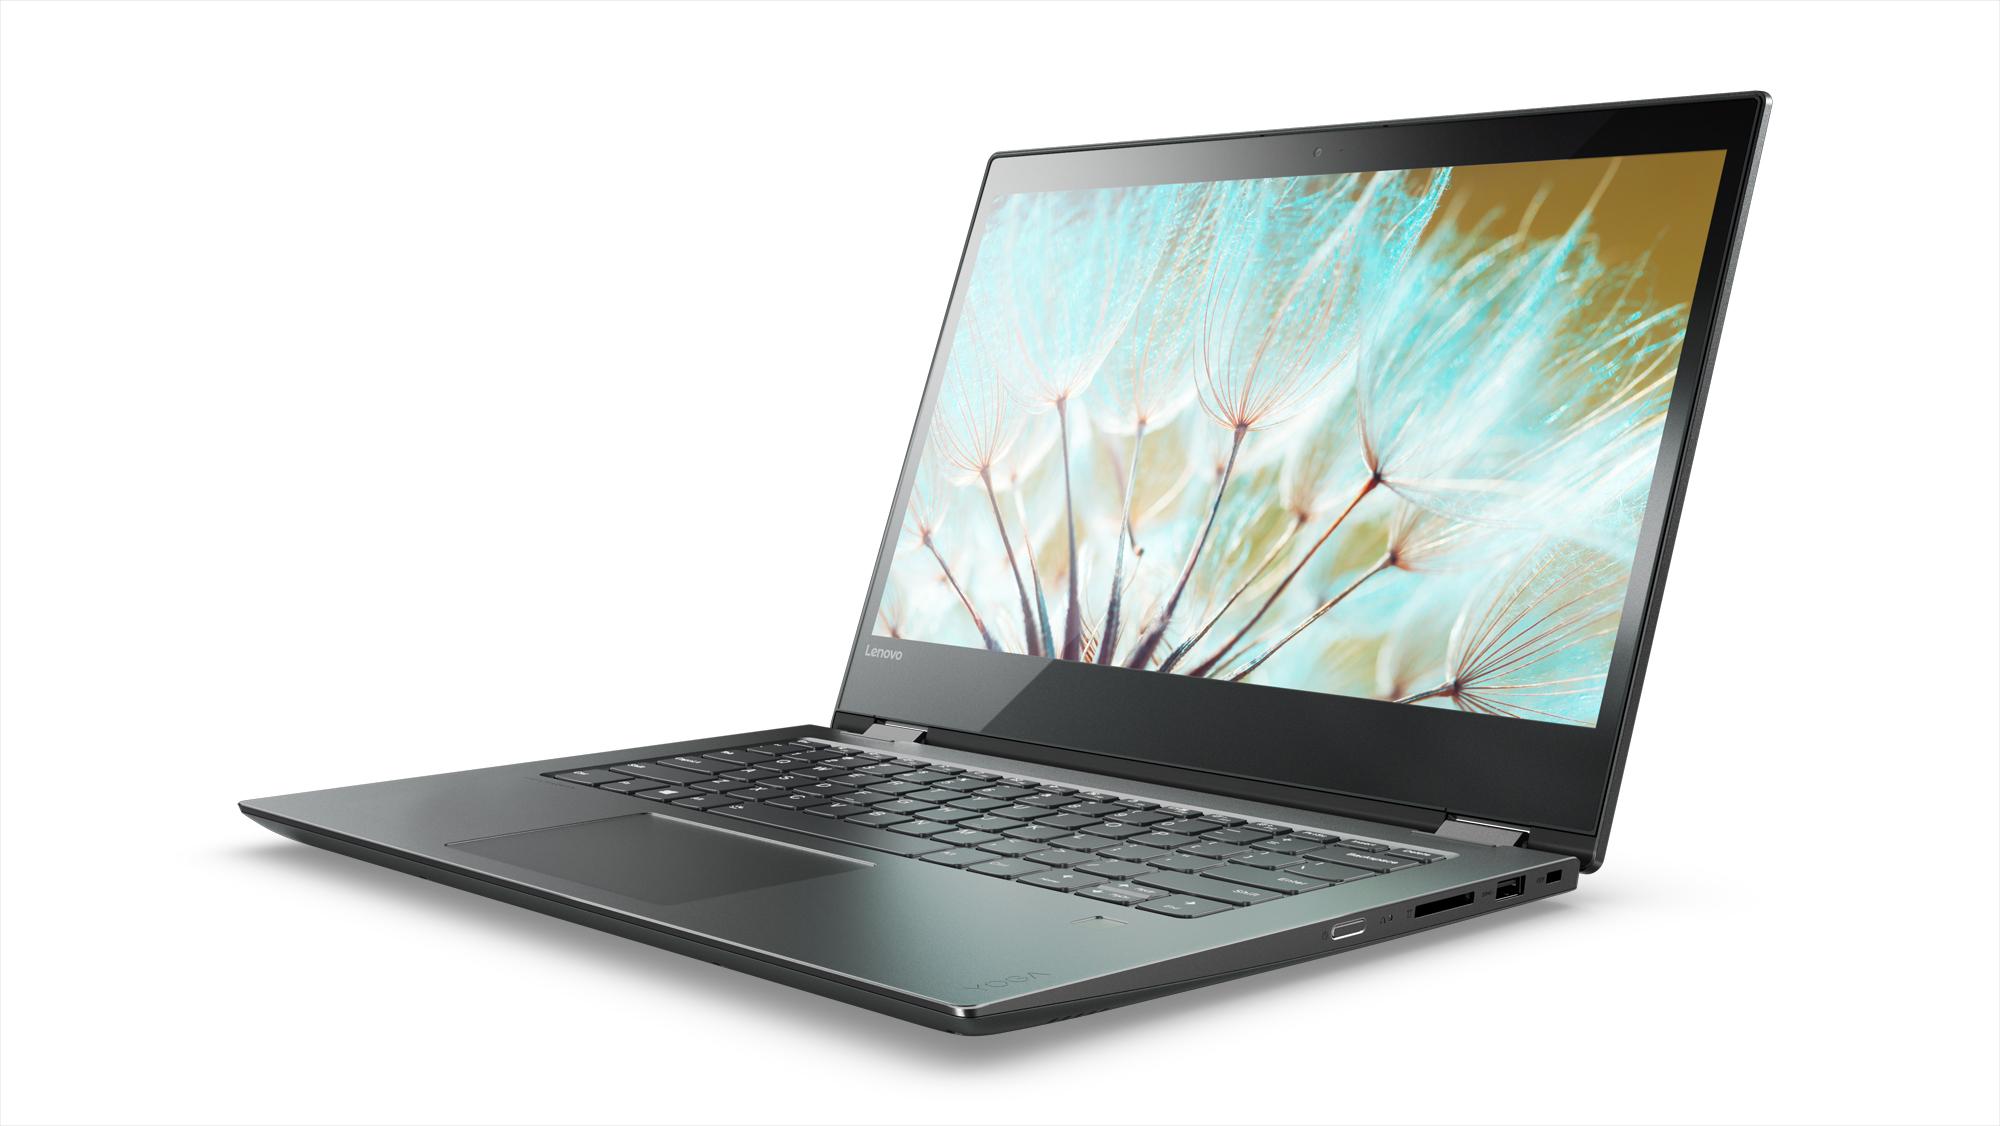 Фото  Ультрабук Lenovo Yoga 520 (81C800DARA) Onyx Black